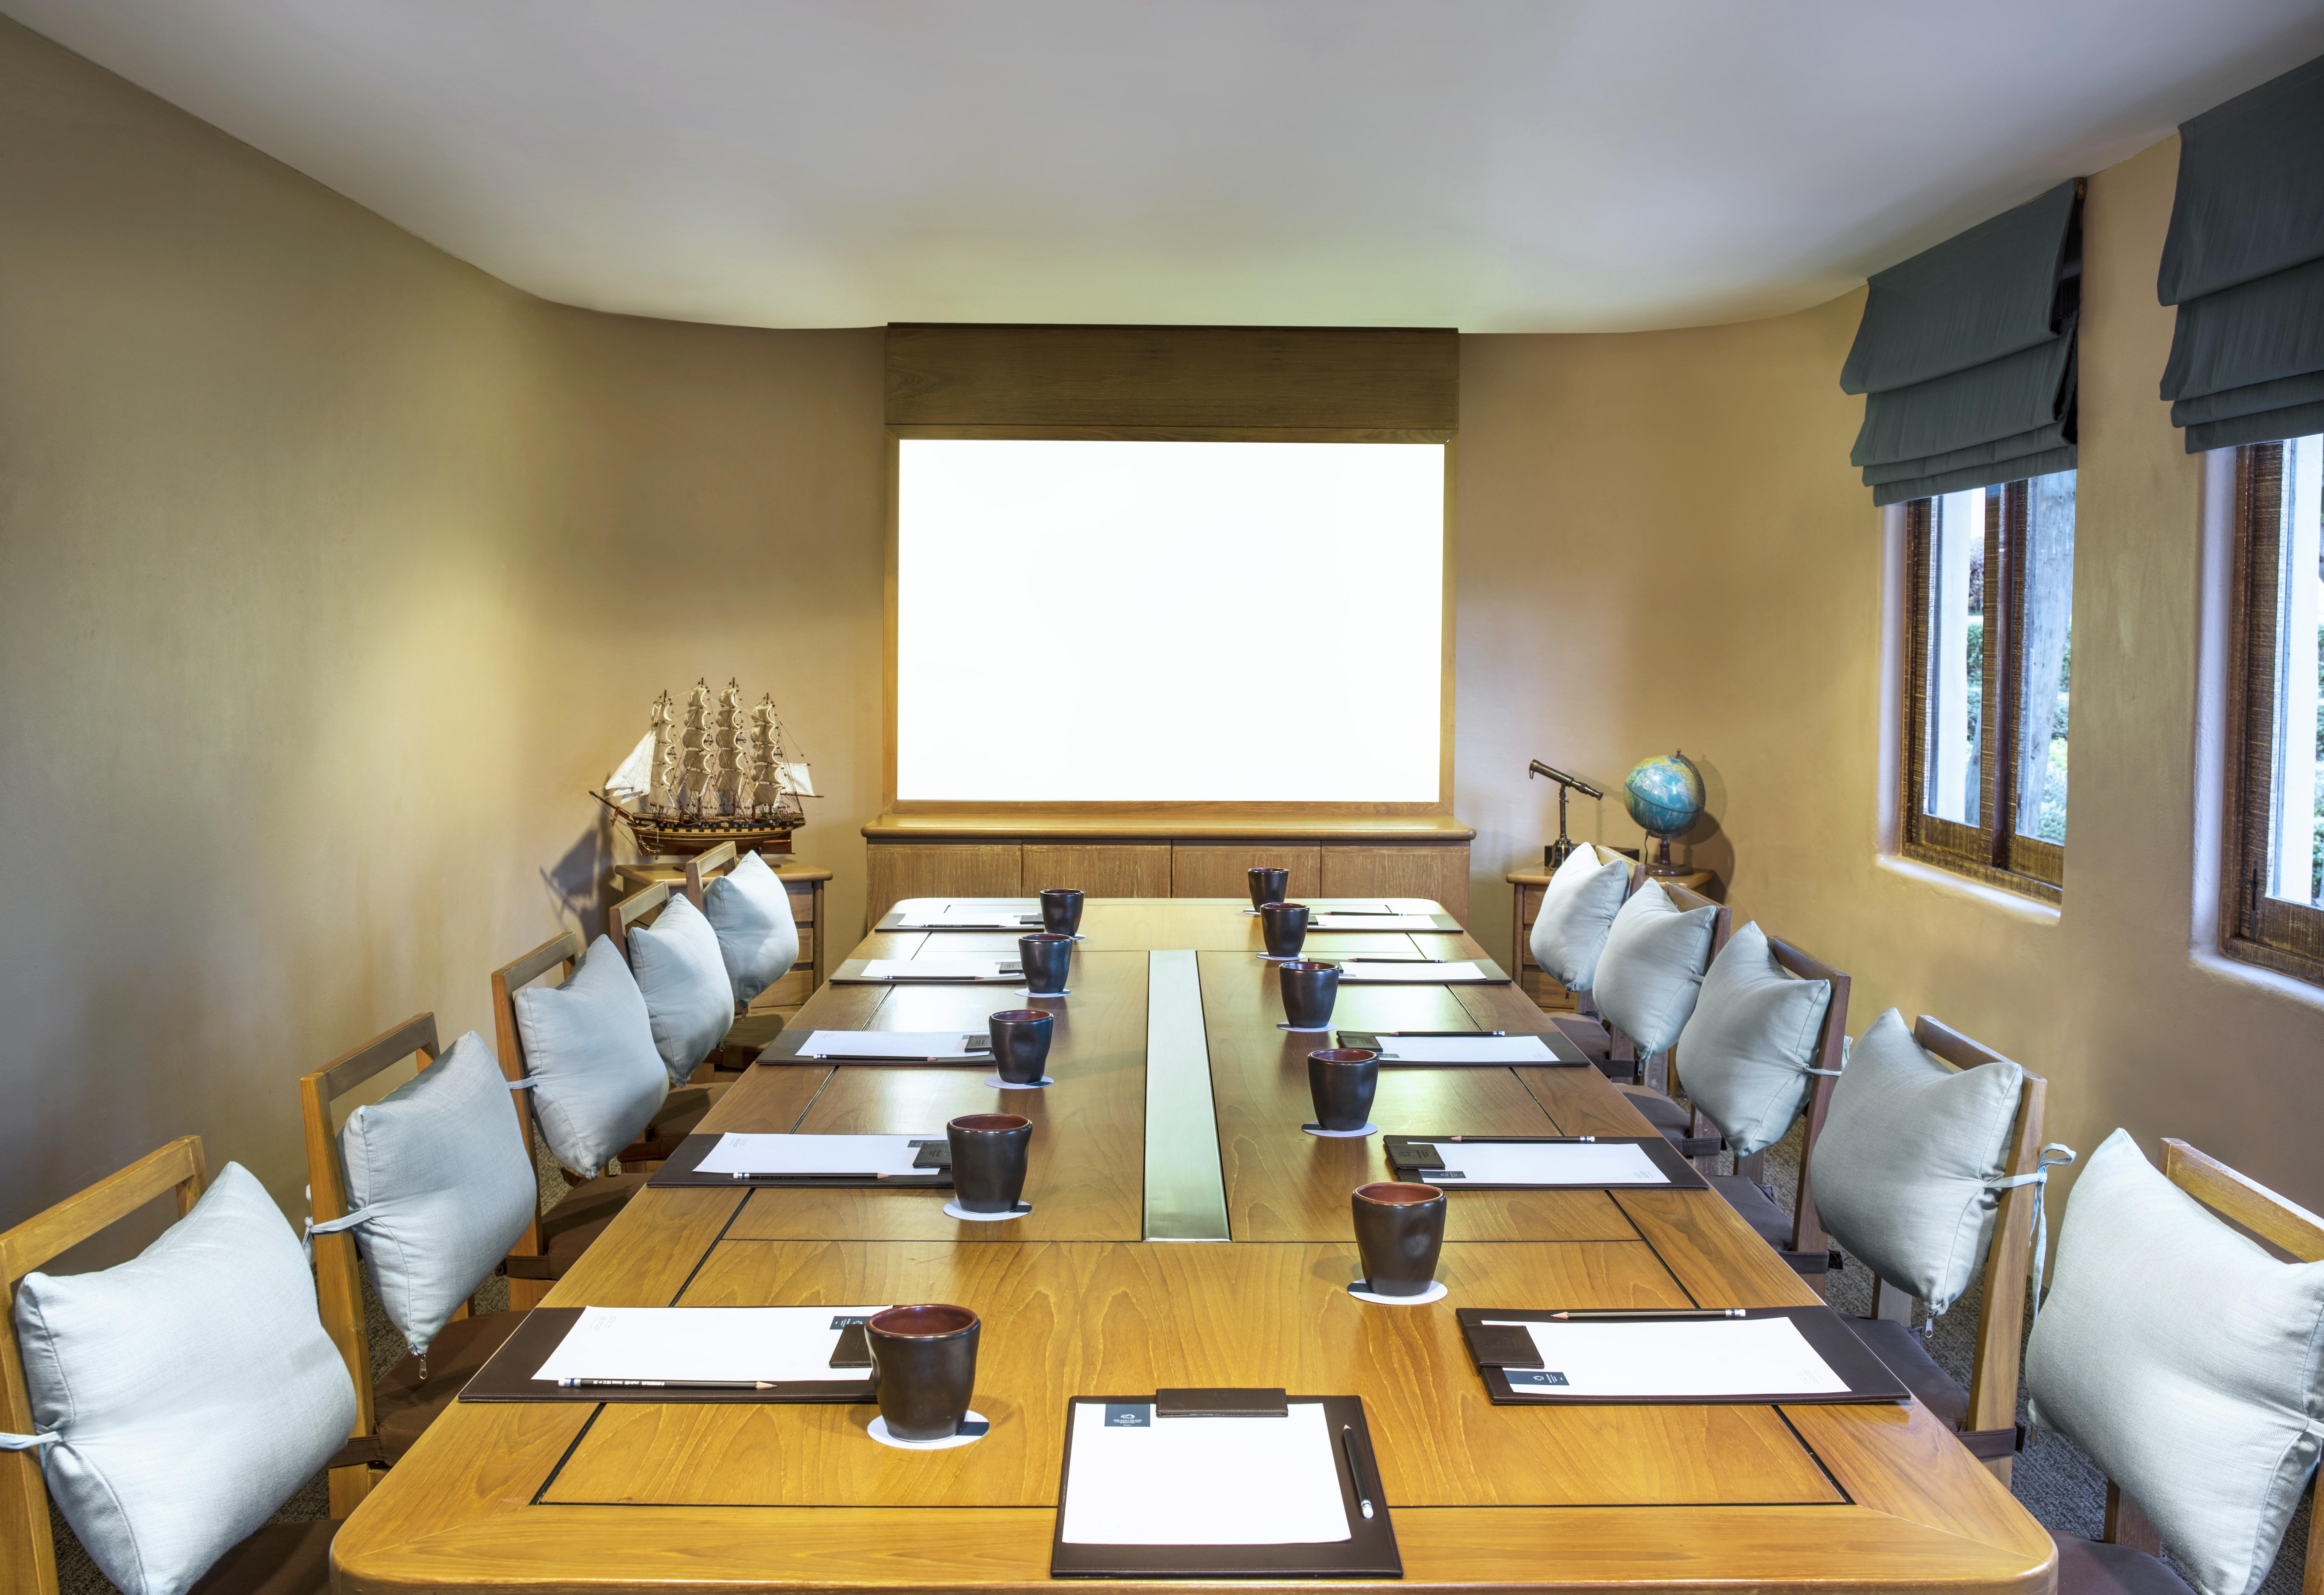 Meeting Room - Boardroom Set-up